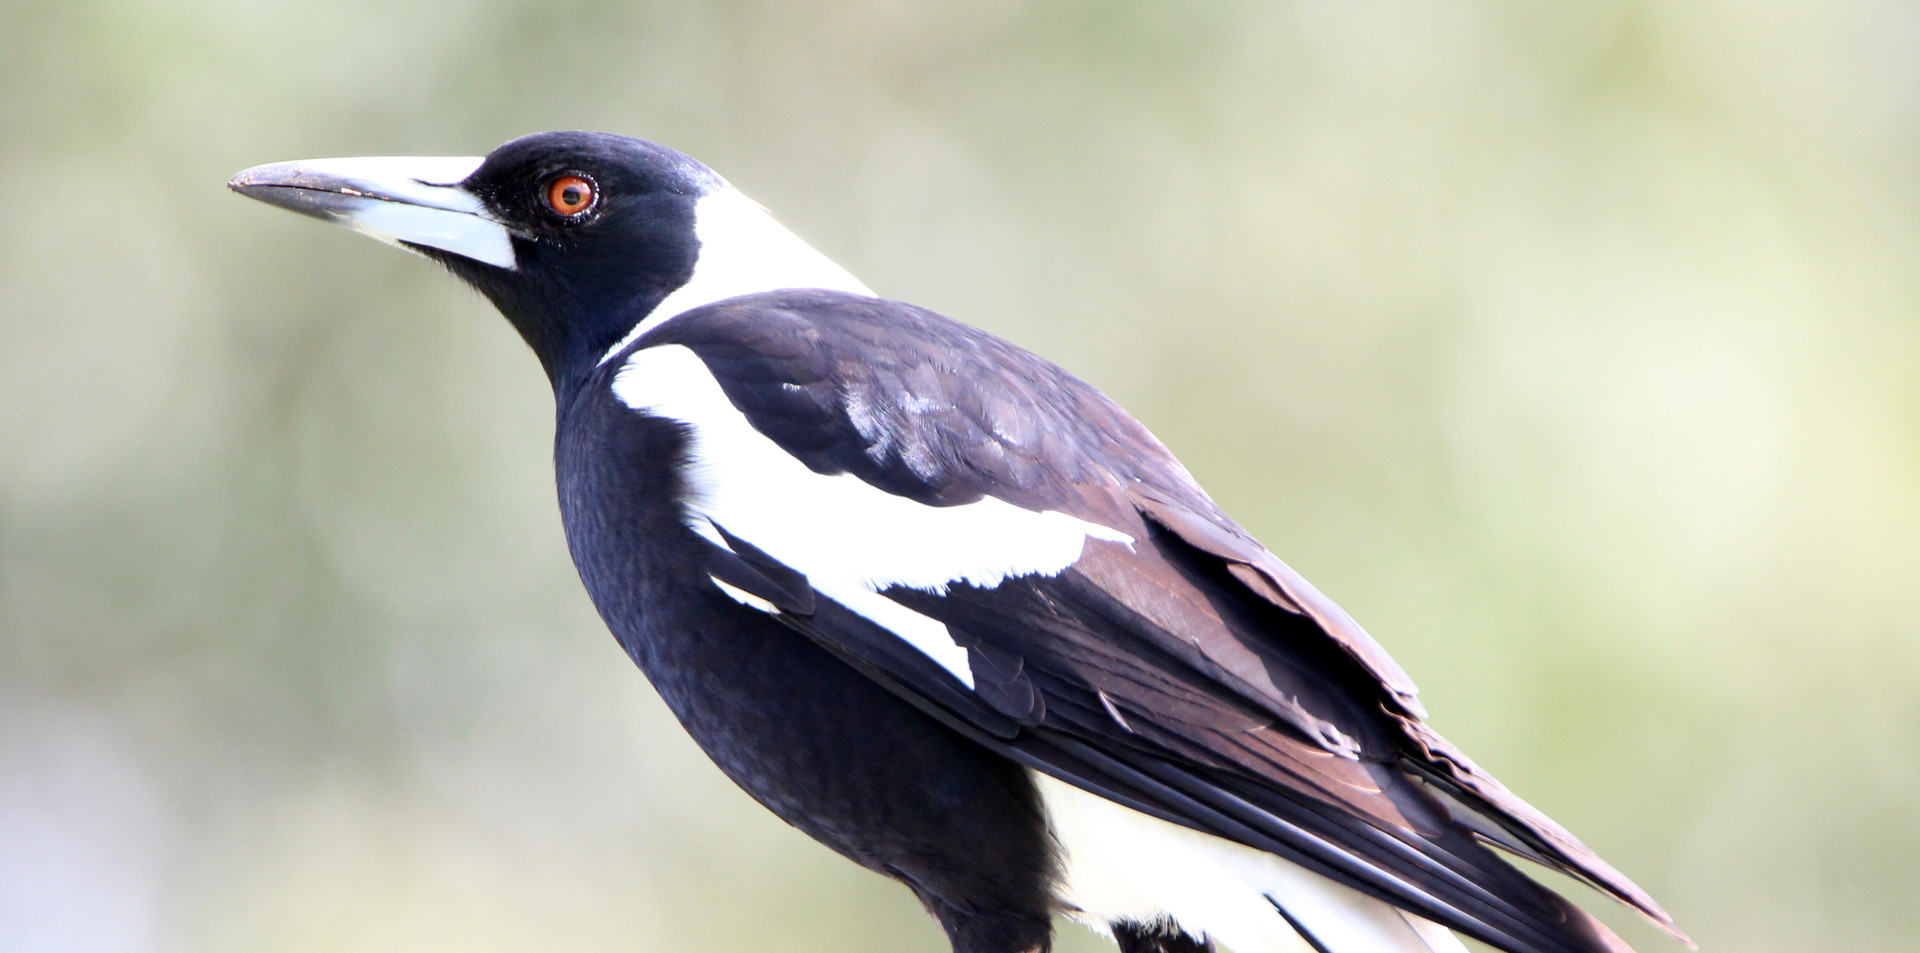 Adult male Australian Magpie